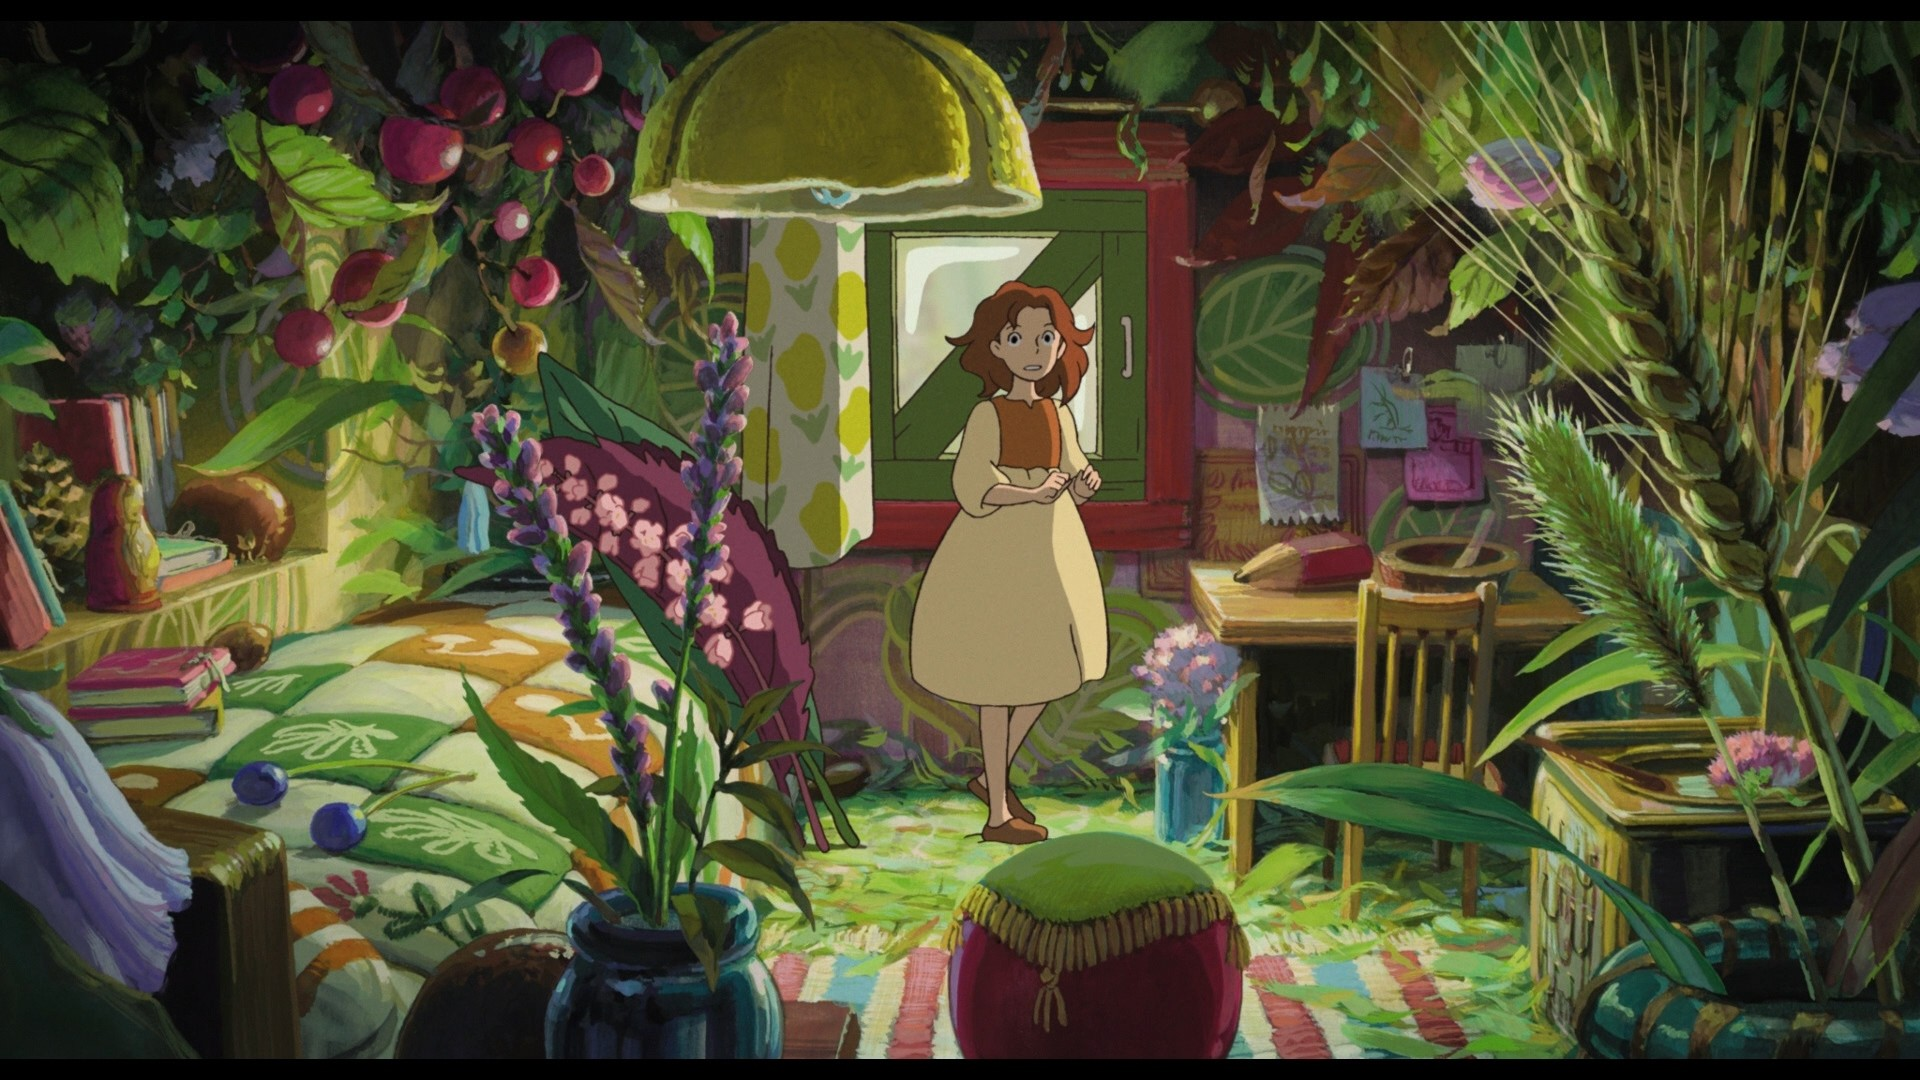 106 best Illust: Hayao Miyazaki & GHIBLI images on Pinterest | Studio  ghibli, The borrowers and The secret